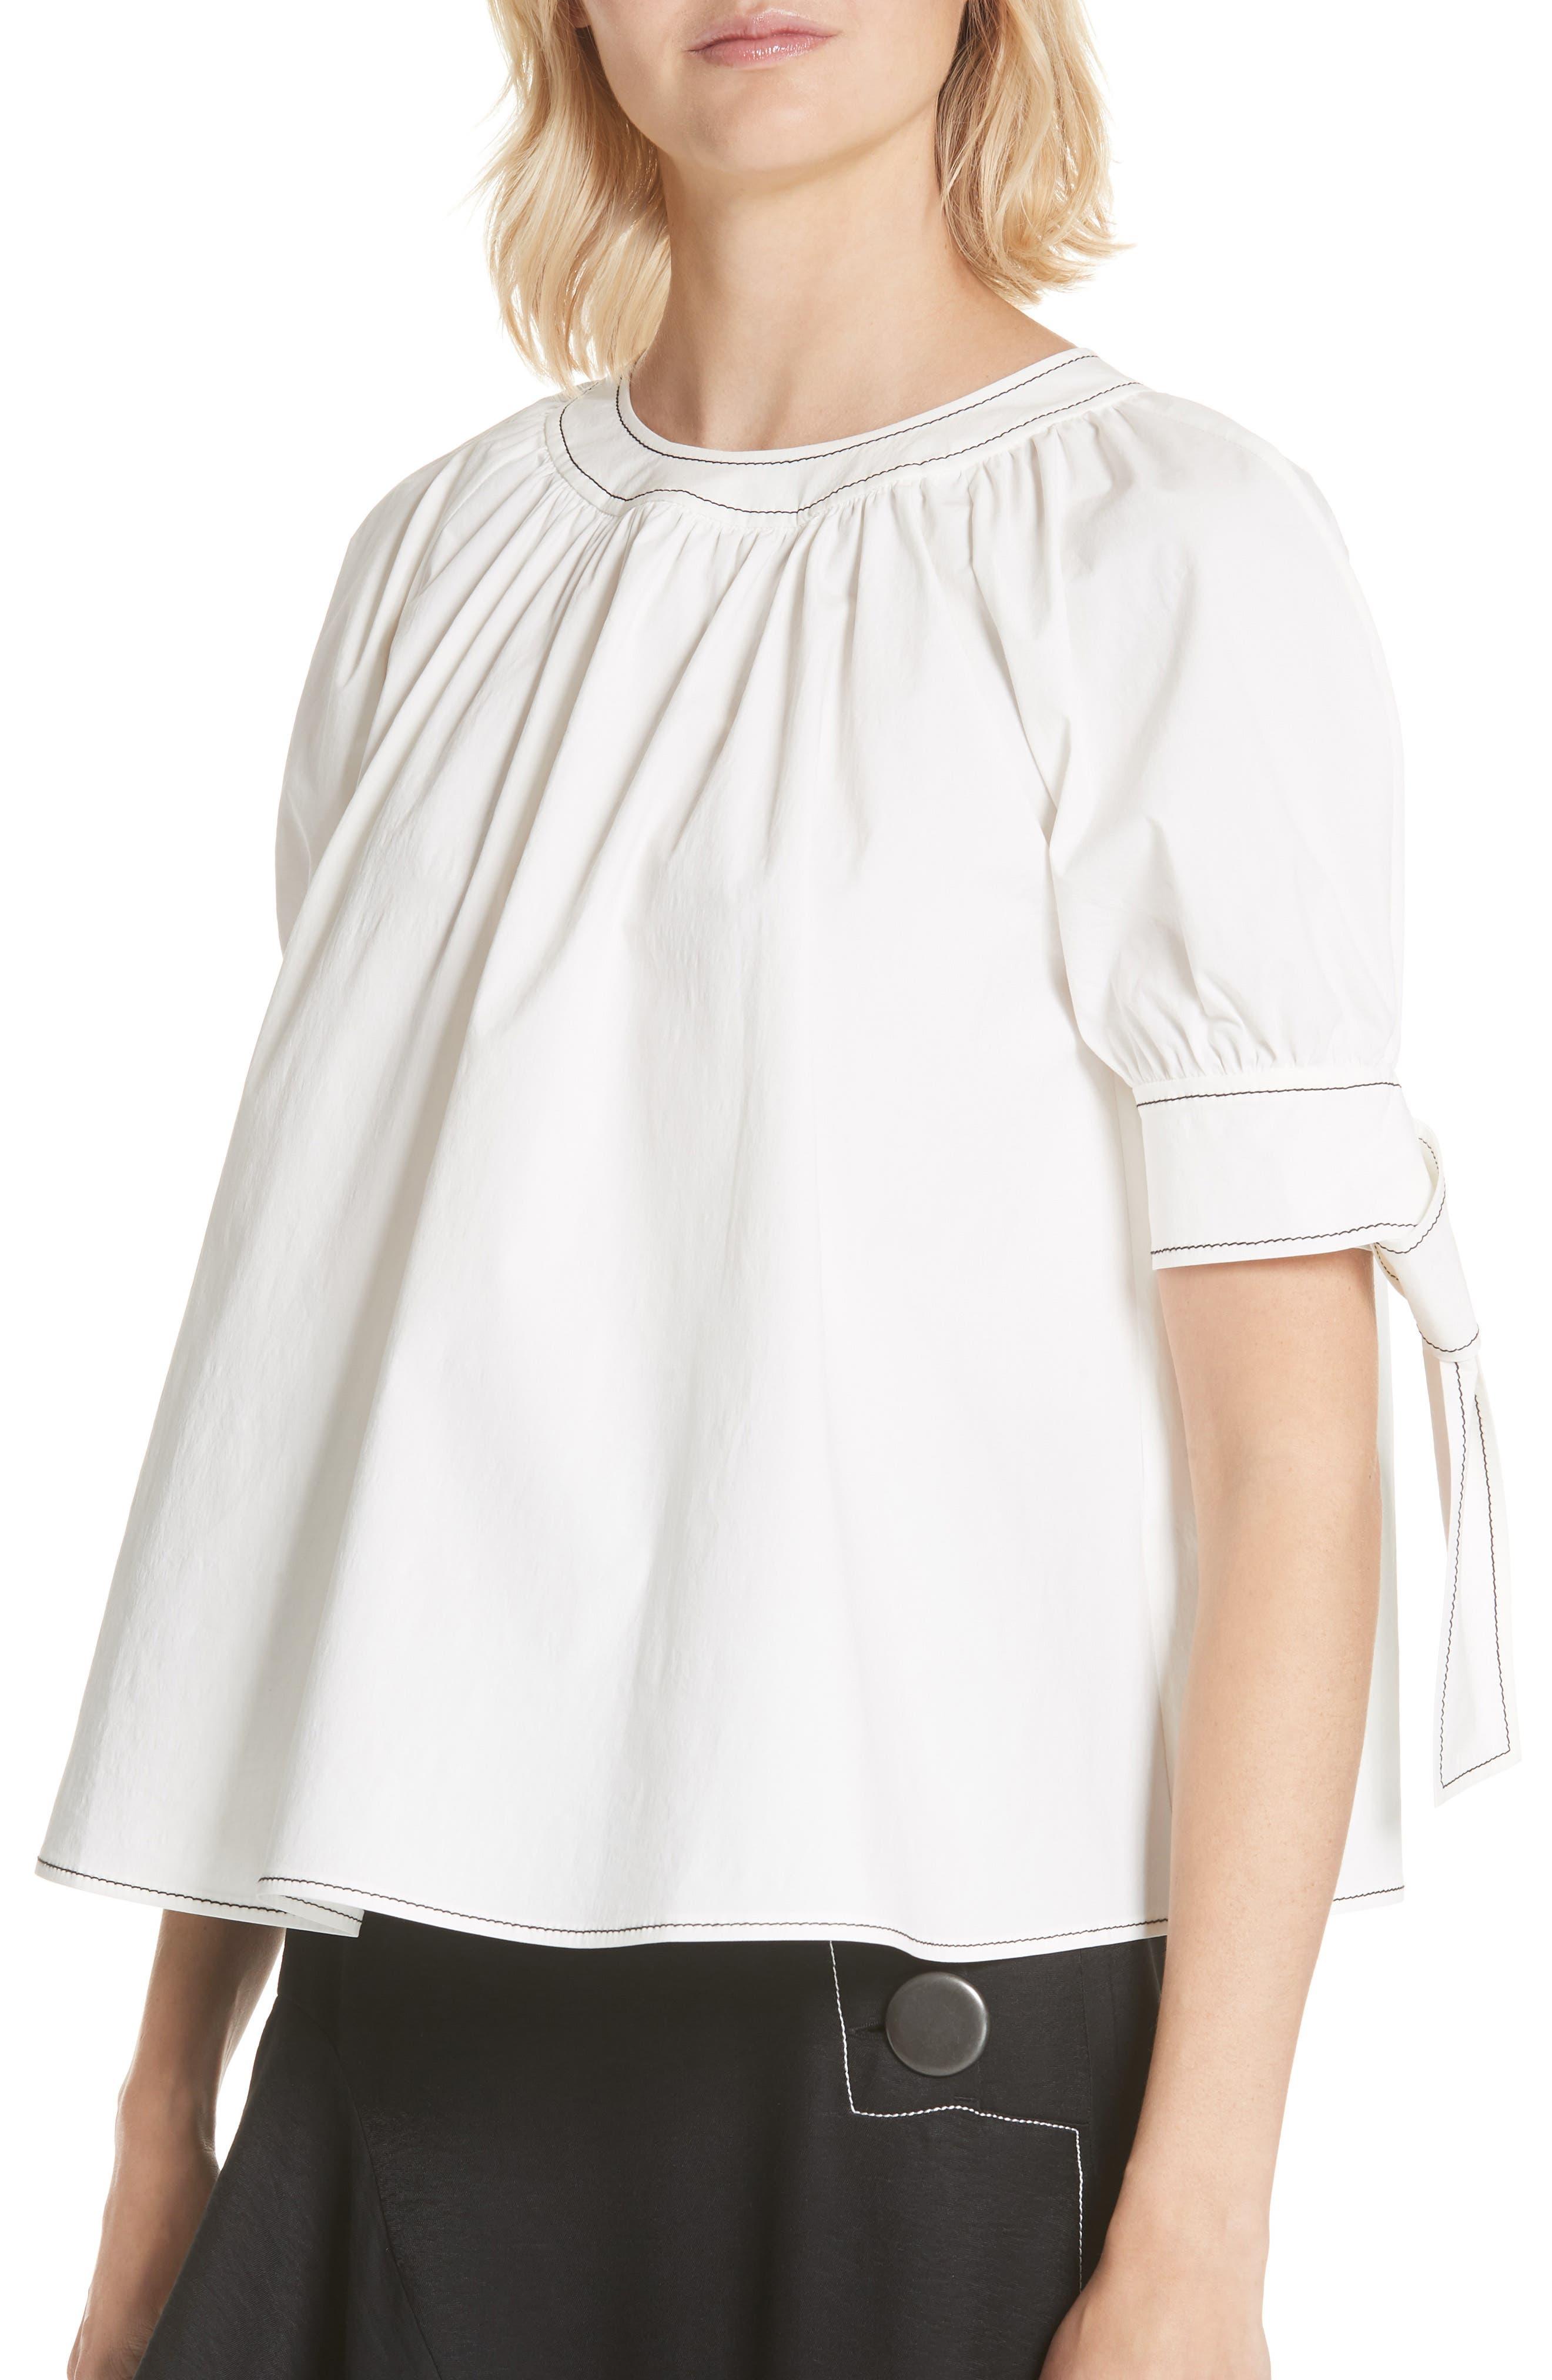 Hailey Short Sleeve Blouse Top,                             Alternate thumbnail 4, color,                             Cotton White